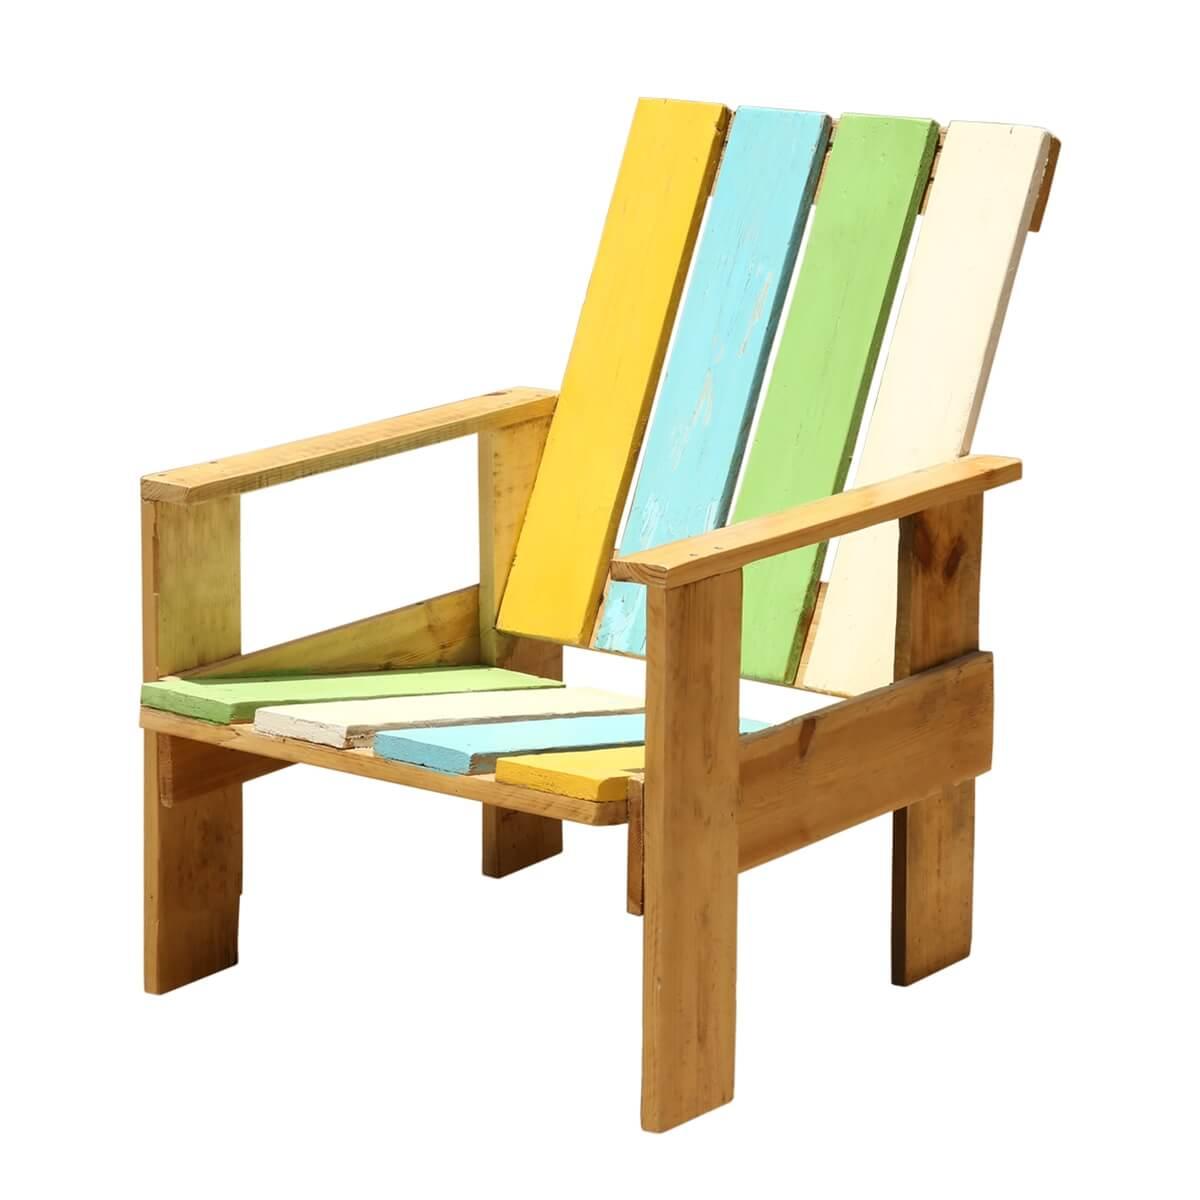 Enjoyable Summer Stripes Adirondack Handmade Patio Chair Download Free Architecture Designs Intelgarnamadebymaigaardcom